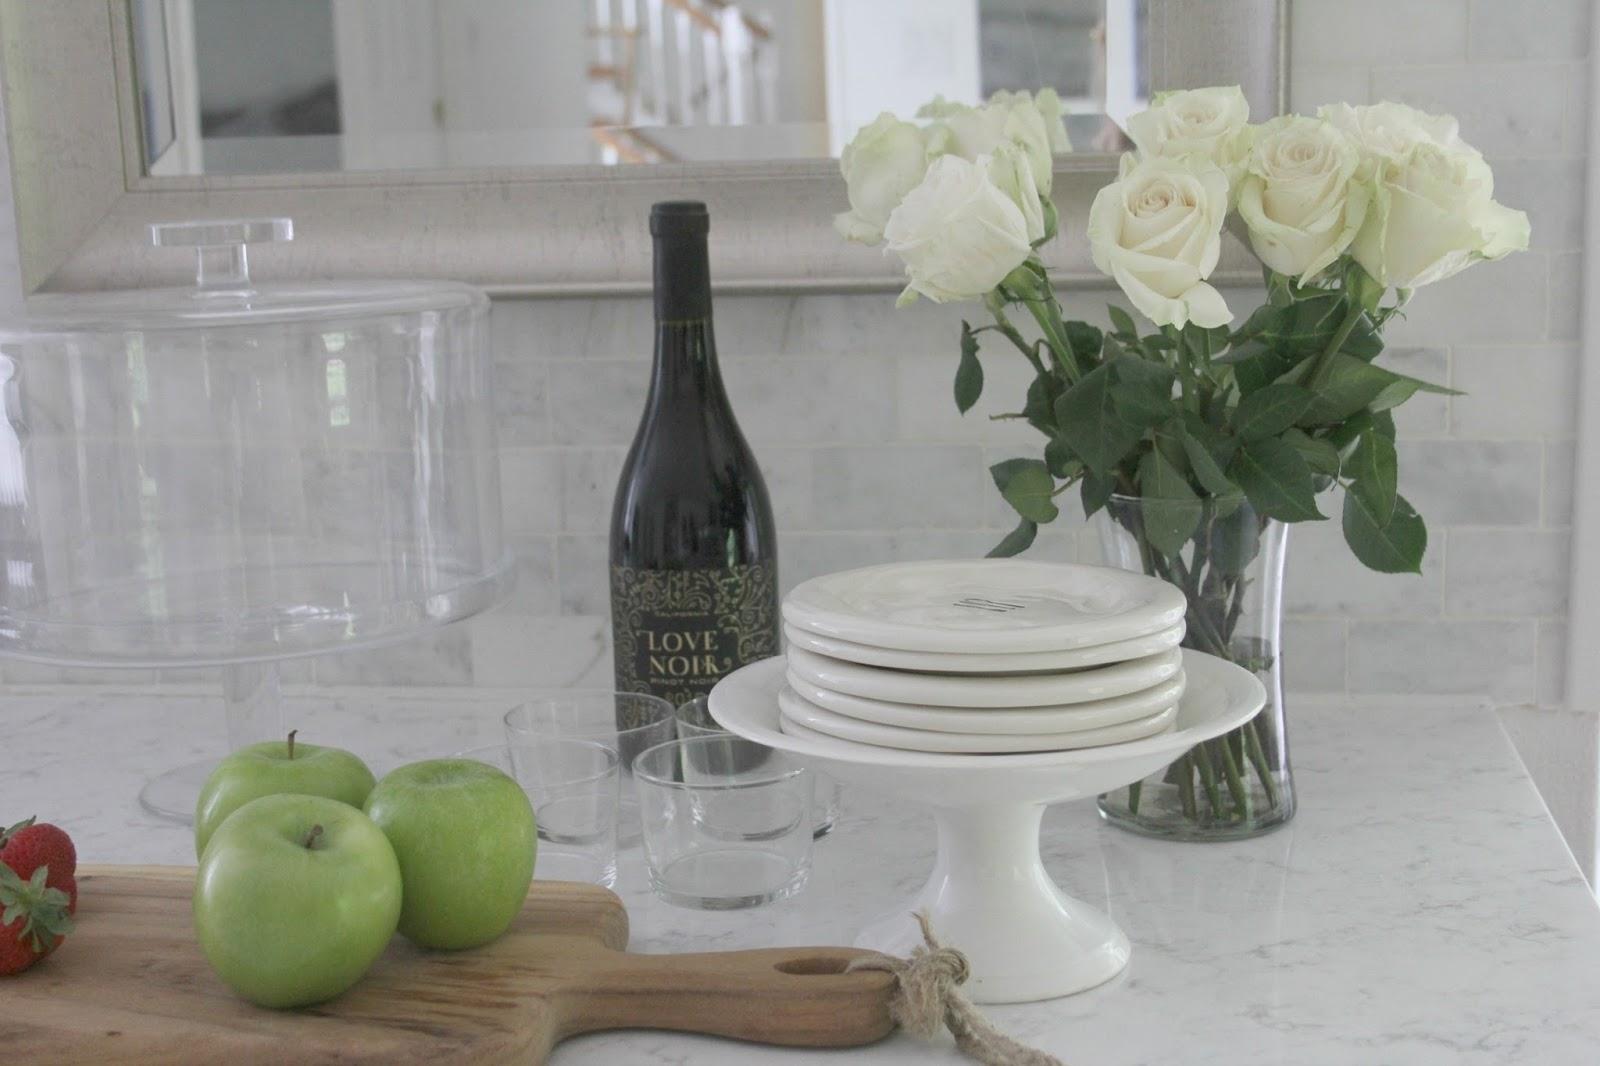 Marble subway tile, quartz countertop, and white roses in modern farmhouse kitchen